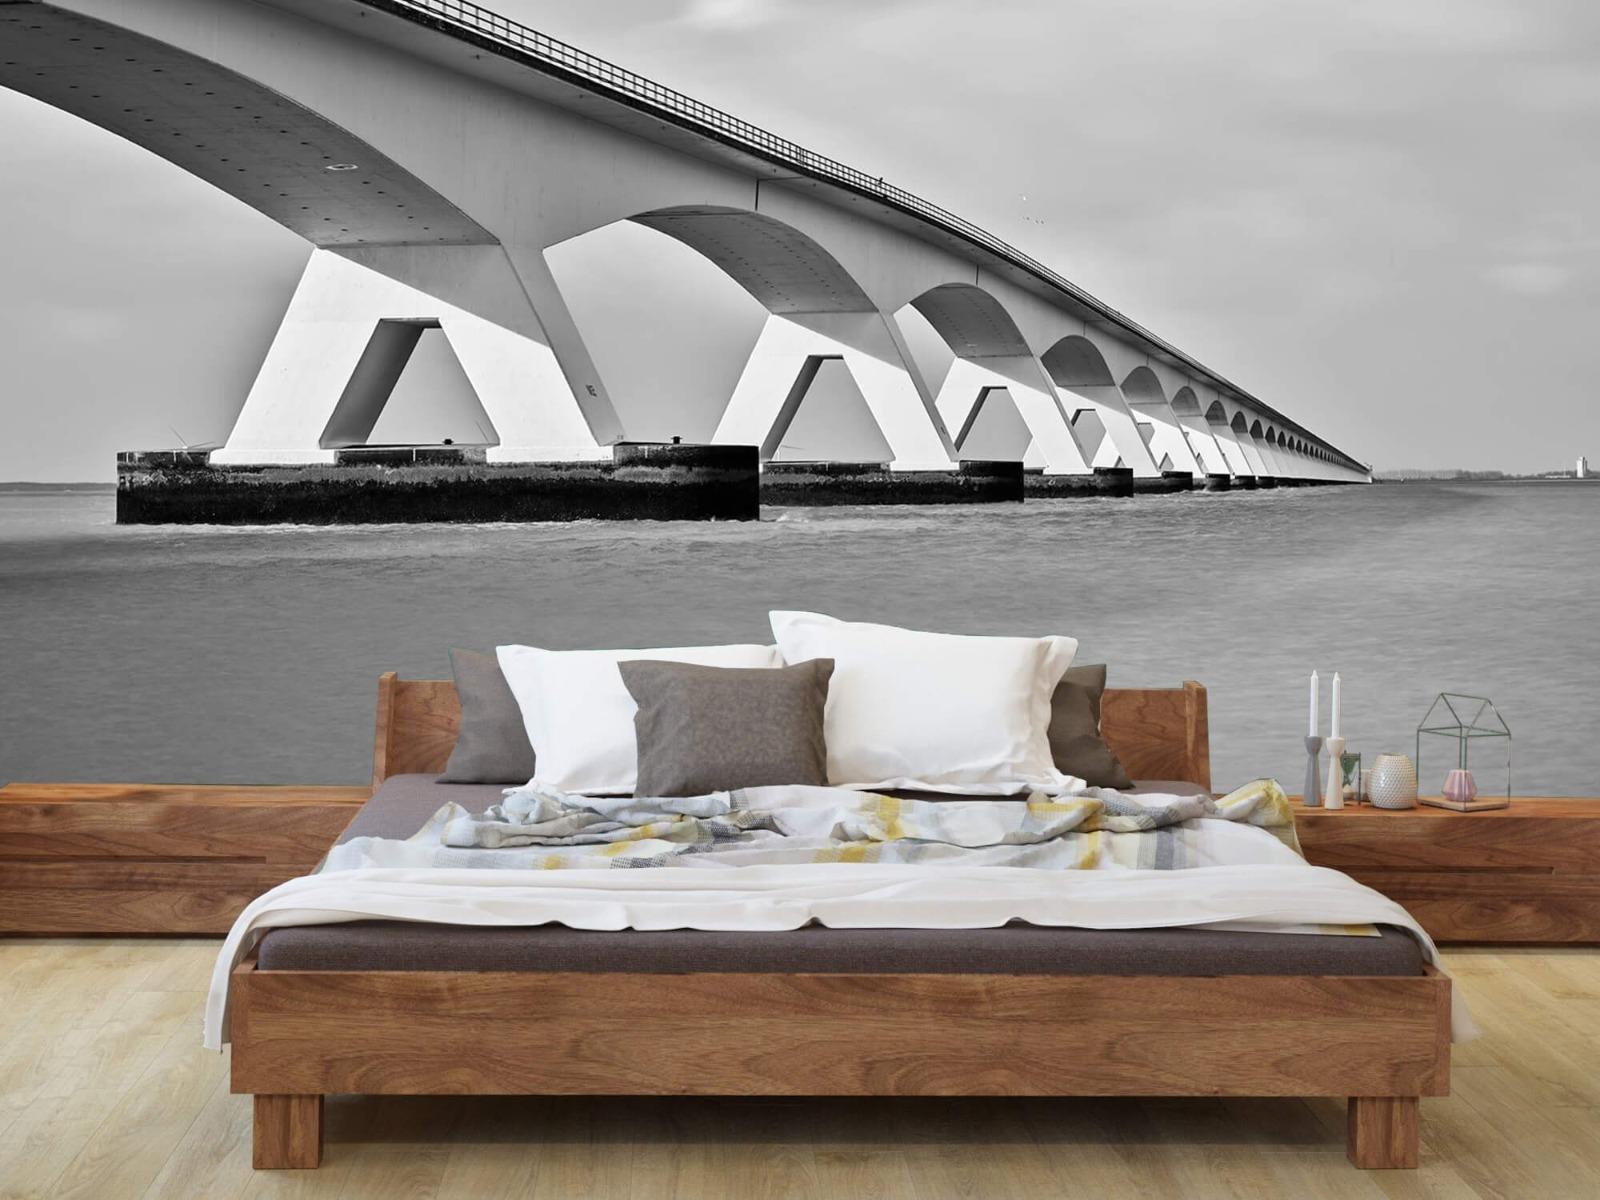 Zwart Wit behang - Lange brug - Kantoor 8